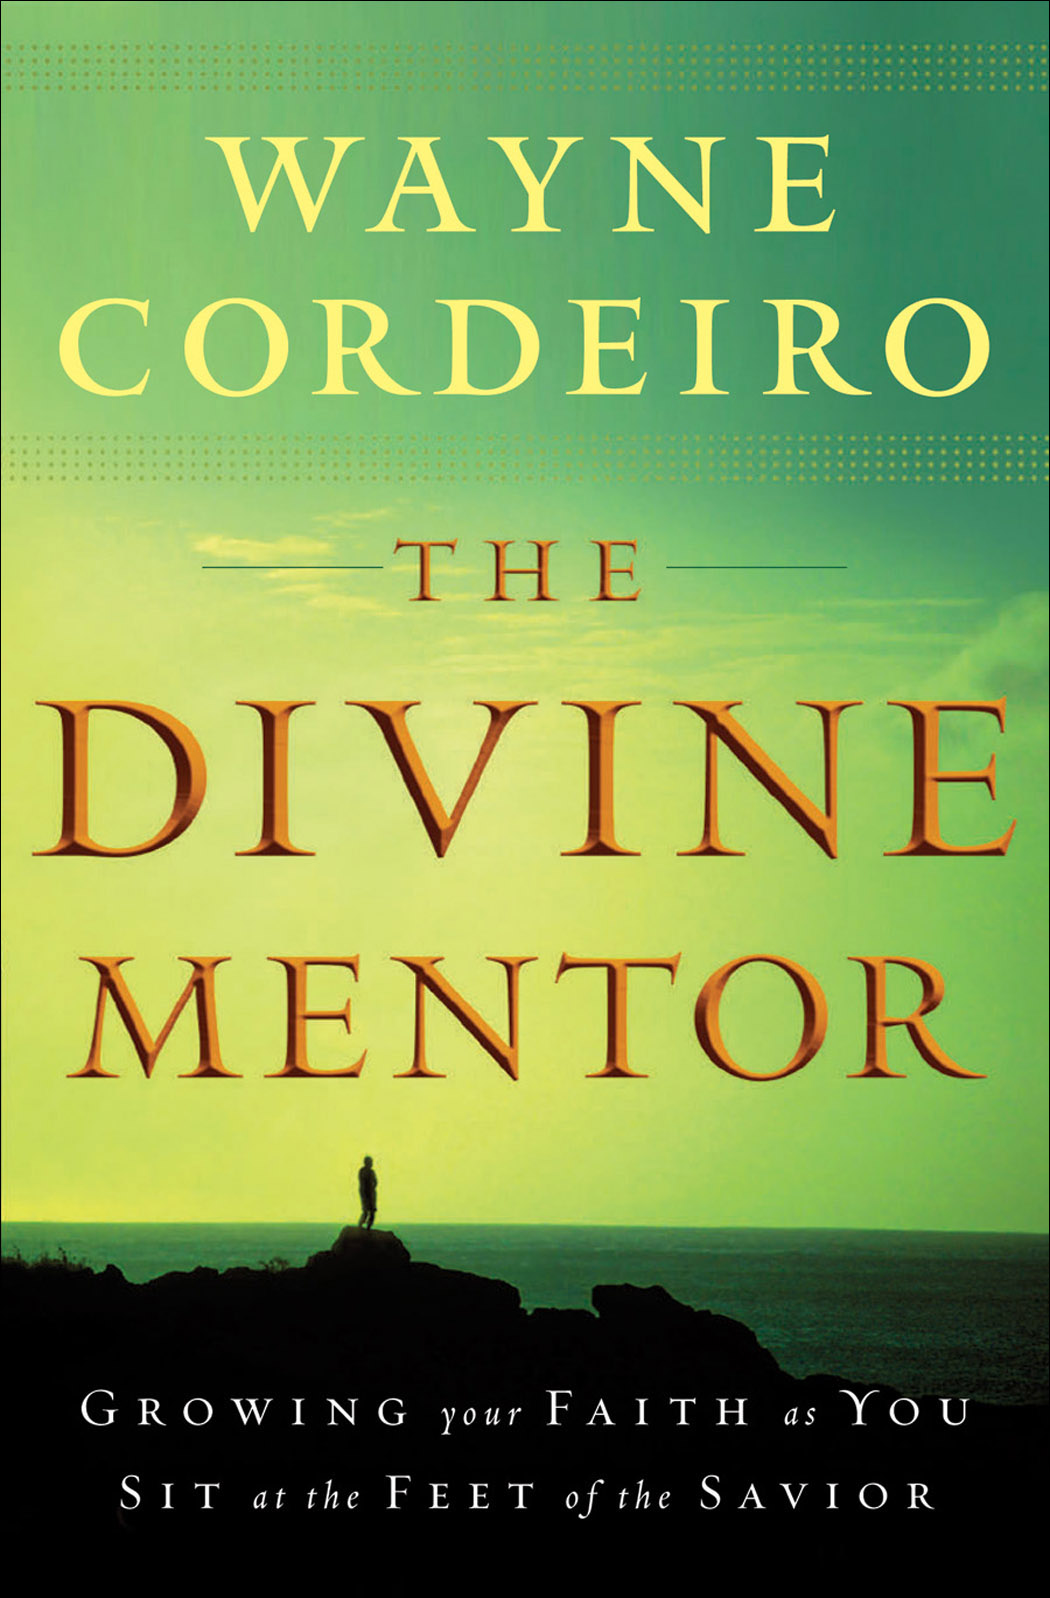 The Divine Mentor  by Wayne Cordeiro